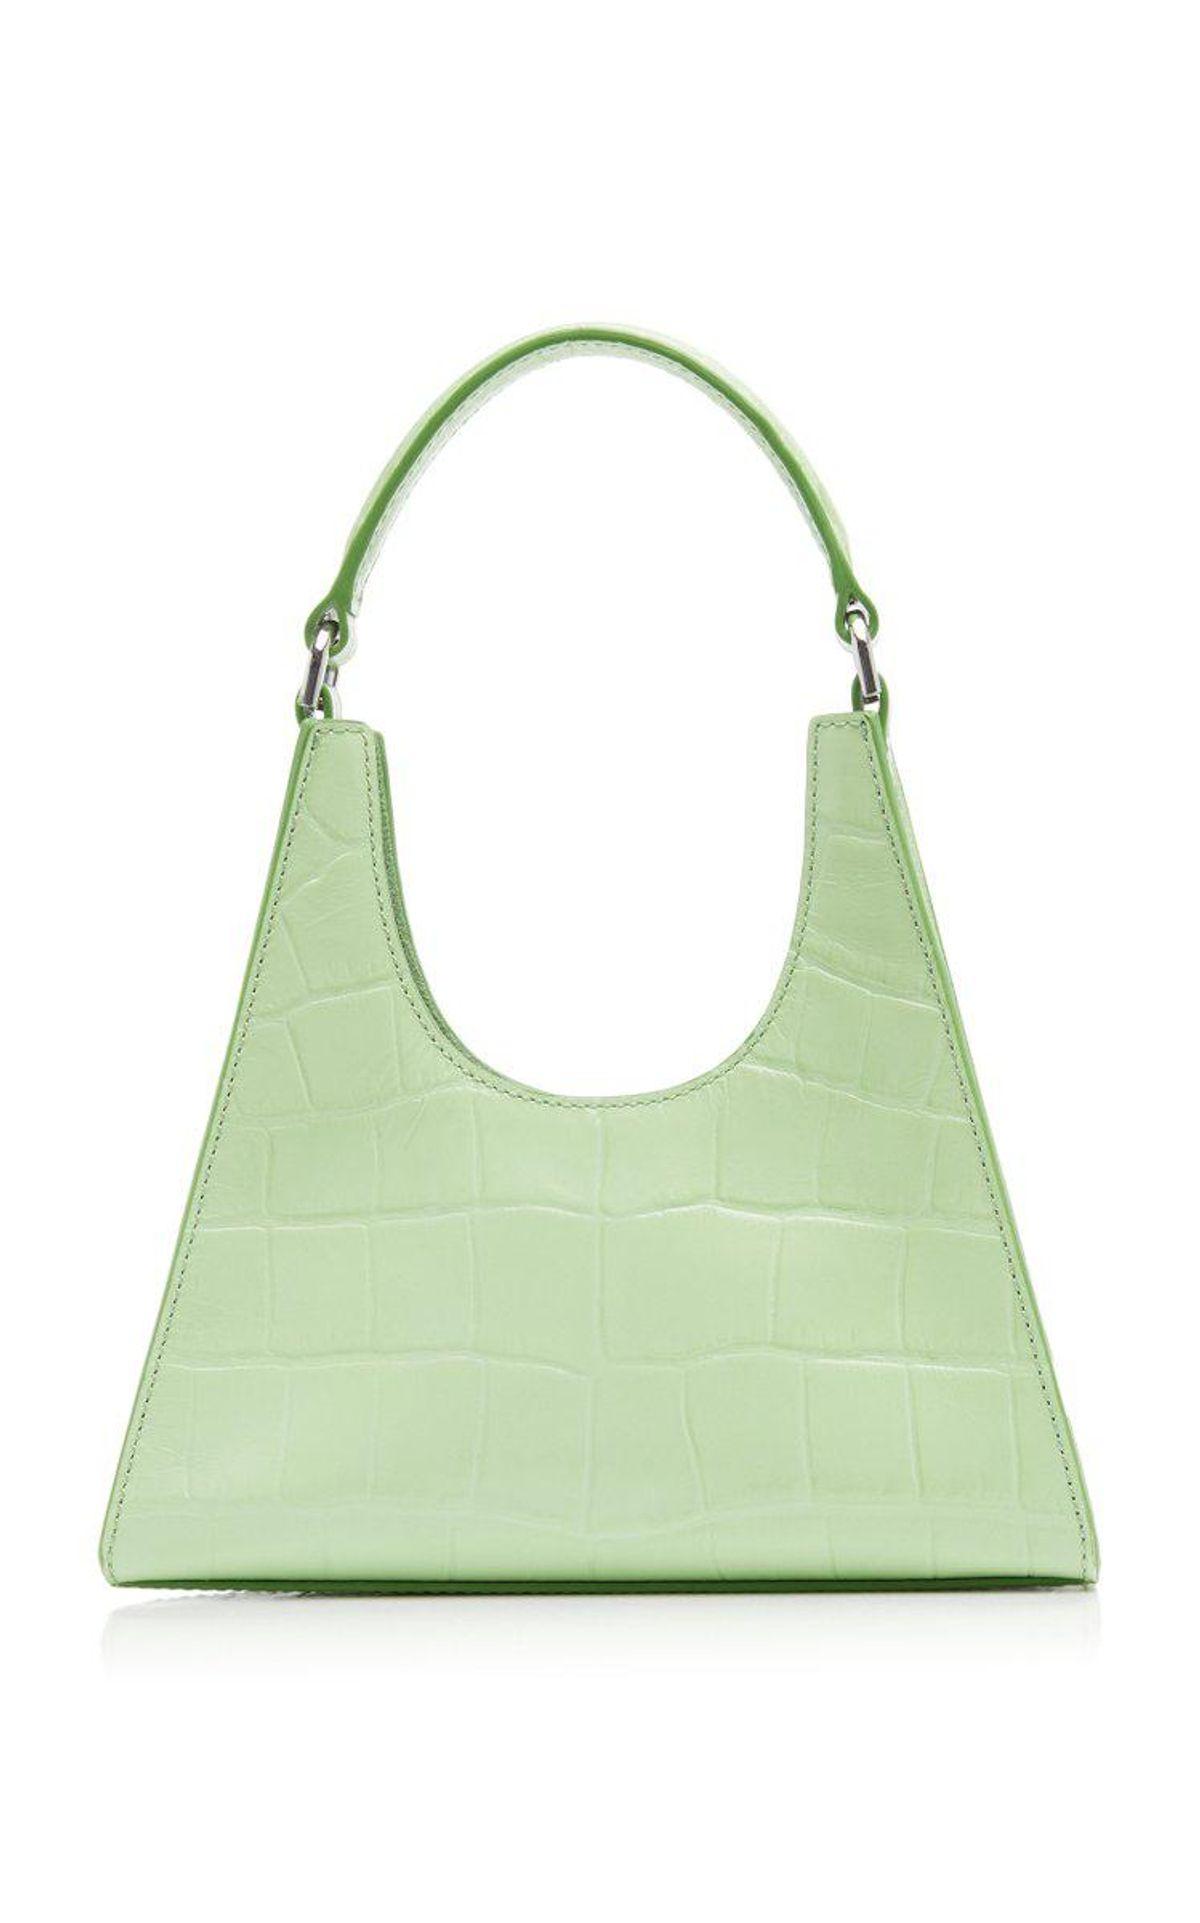 Rey Mini Croc Effect Leather Shoulder Bag